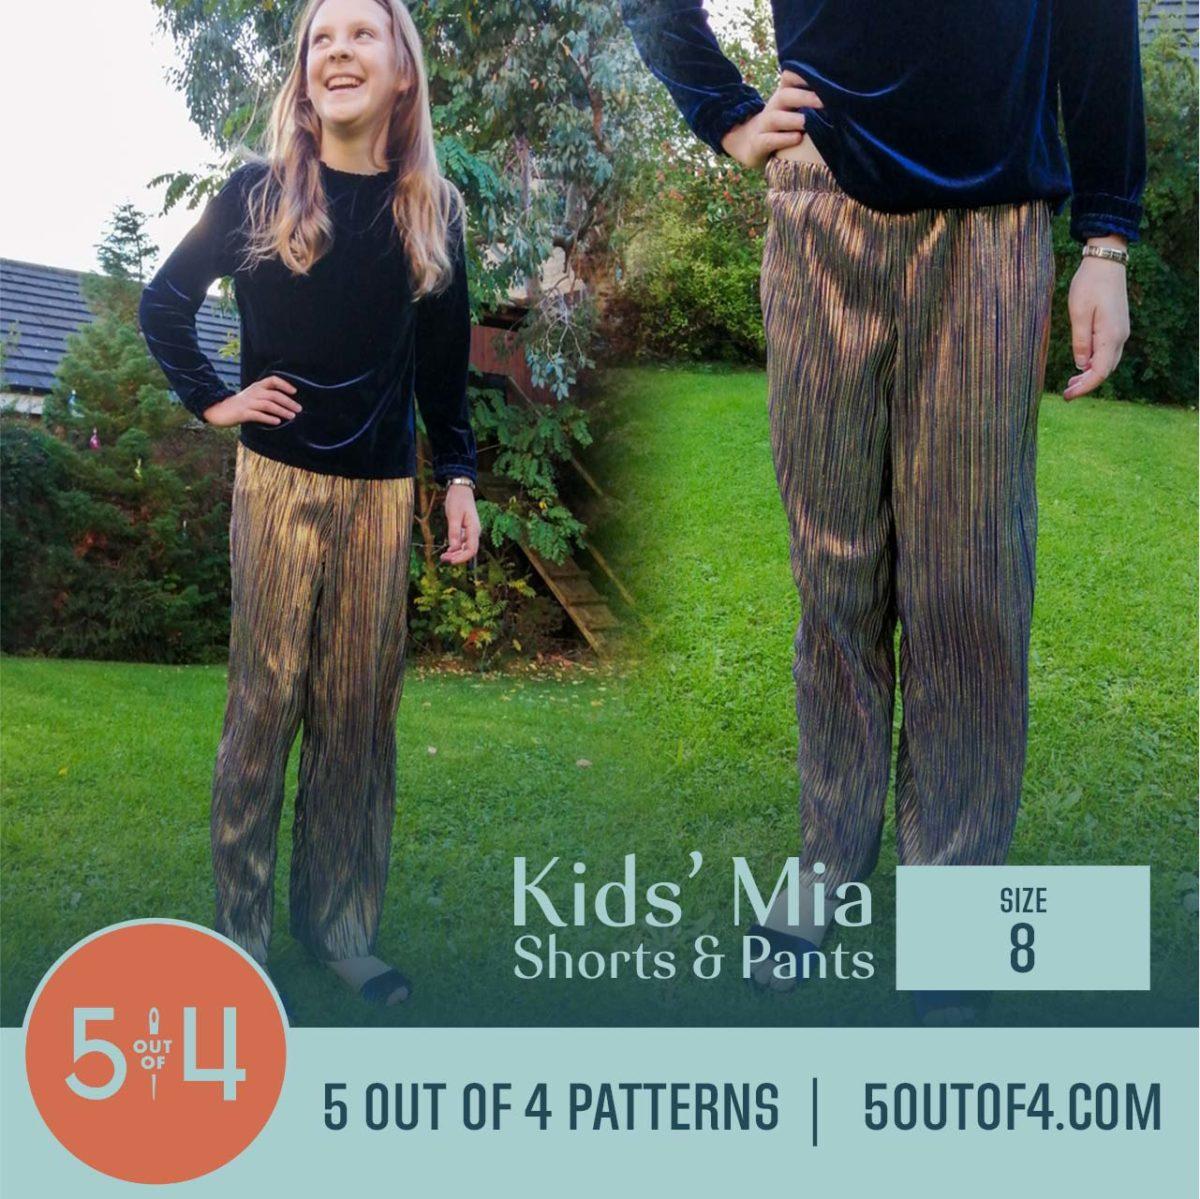 5oo4 Patterns Kids' Mia Pants Size 8